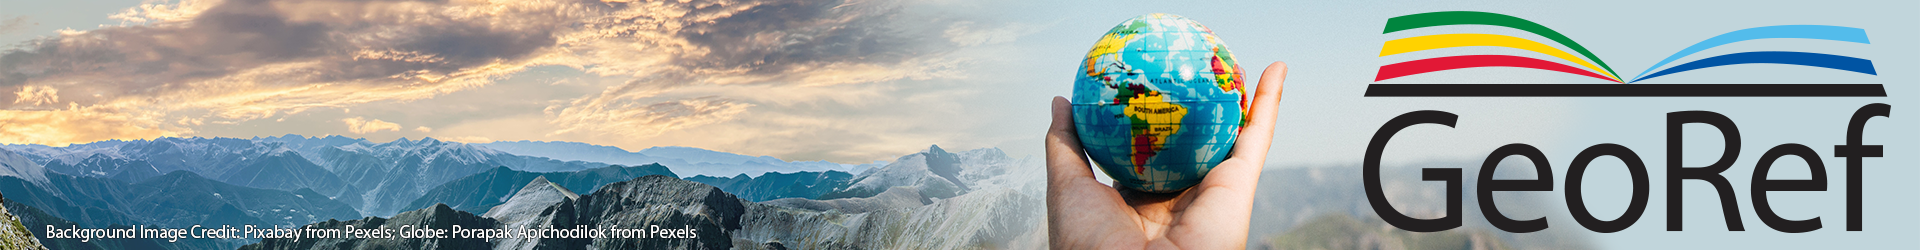 GeoRef Reaches 4 Million References. Background Images: Mountains: Pixabay/Pexels; Globe: Porapak Apichodilok/Pexels